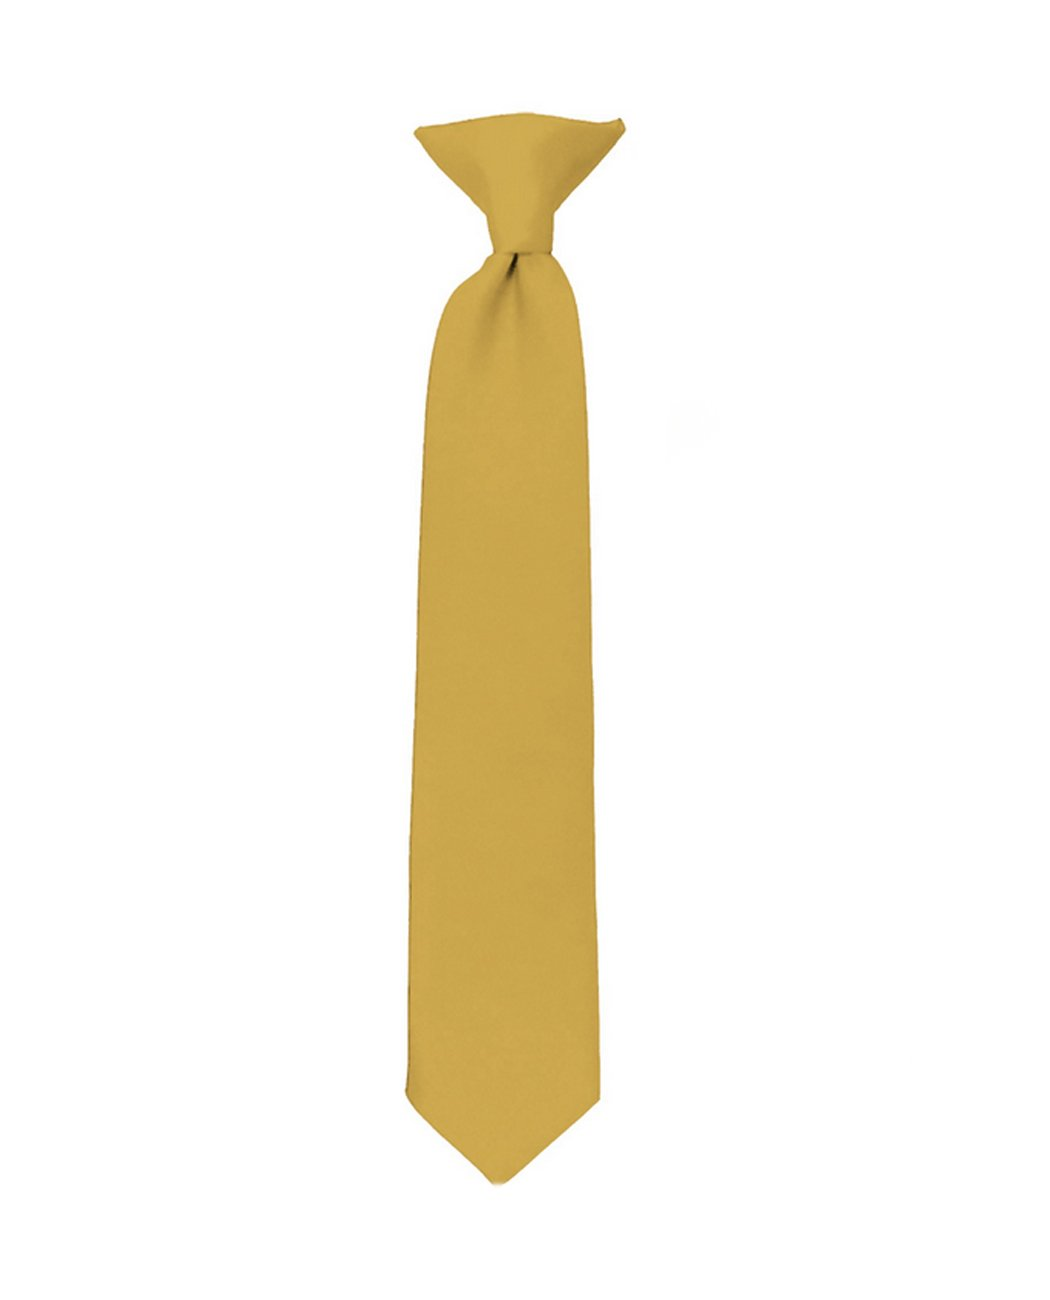 11 Kelly Green NYFASHION101 Boys Kids Childrens Solid Clip on Tie